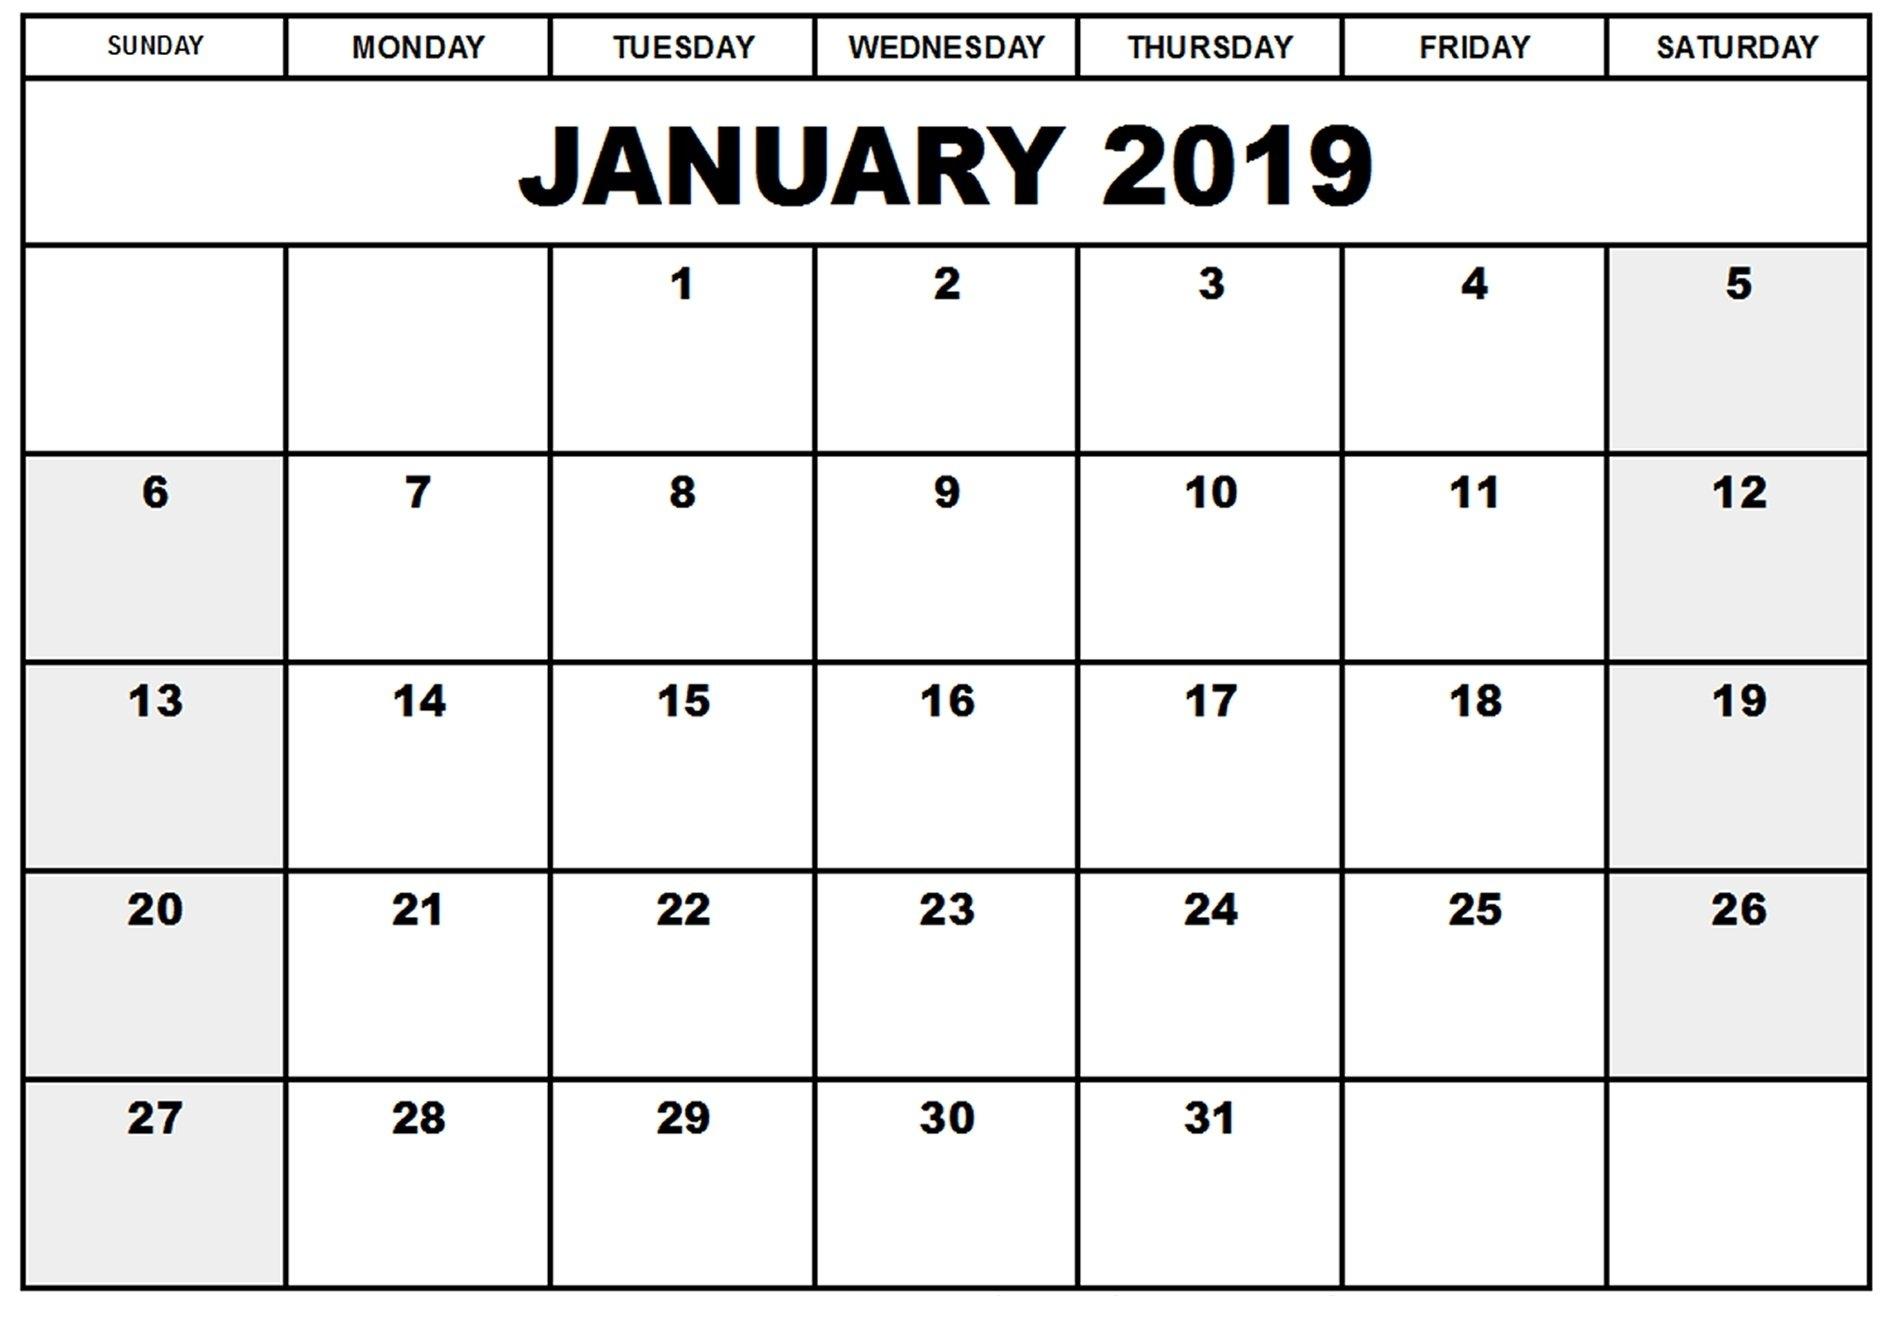 January 2019 Calendar Printable With Holidays   Printable Calendar Calendar 2019 January With Holidays